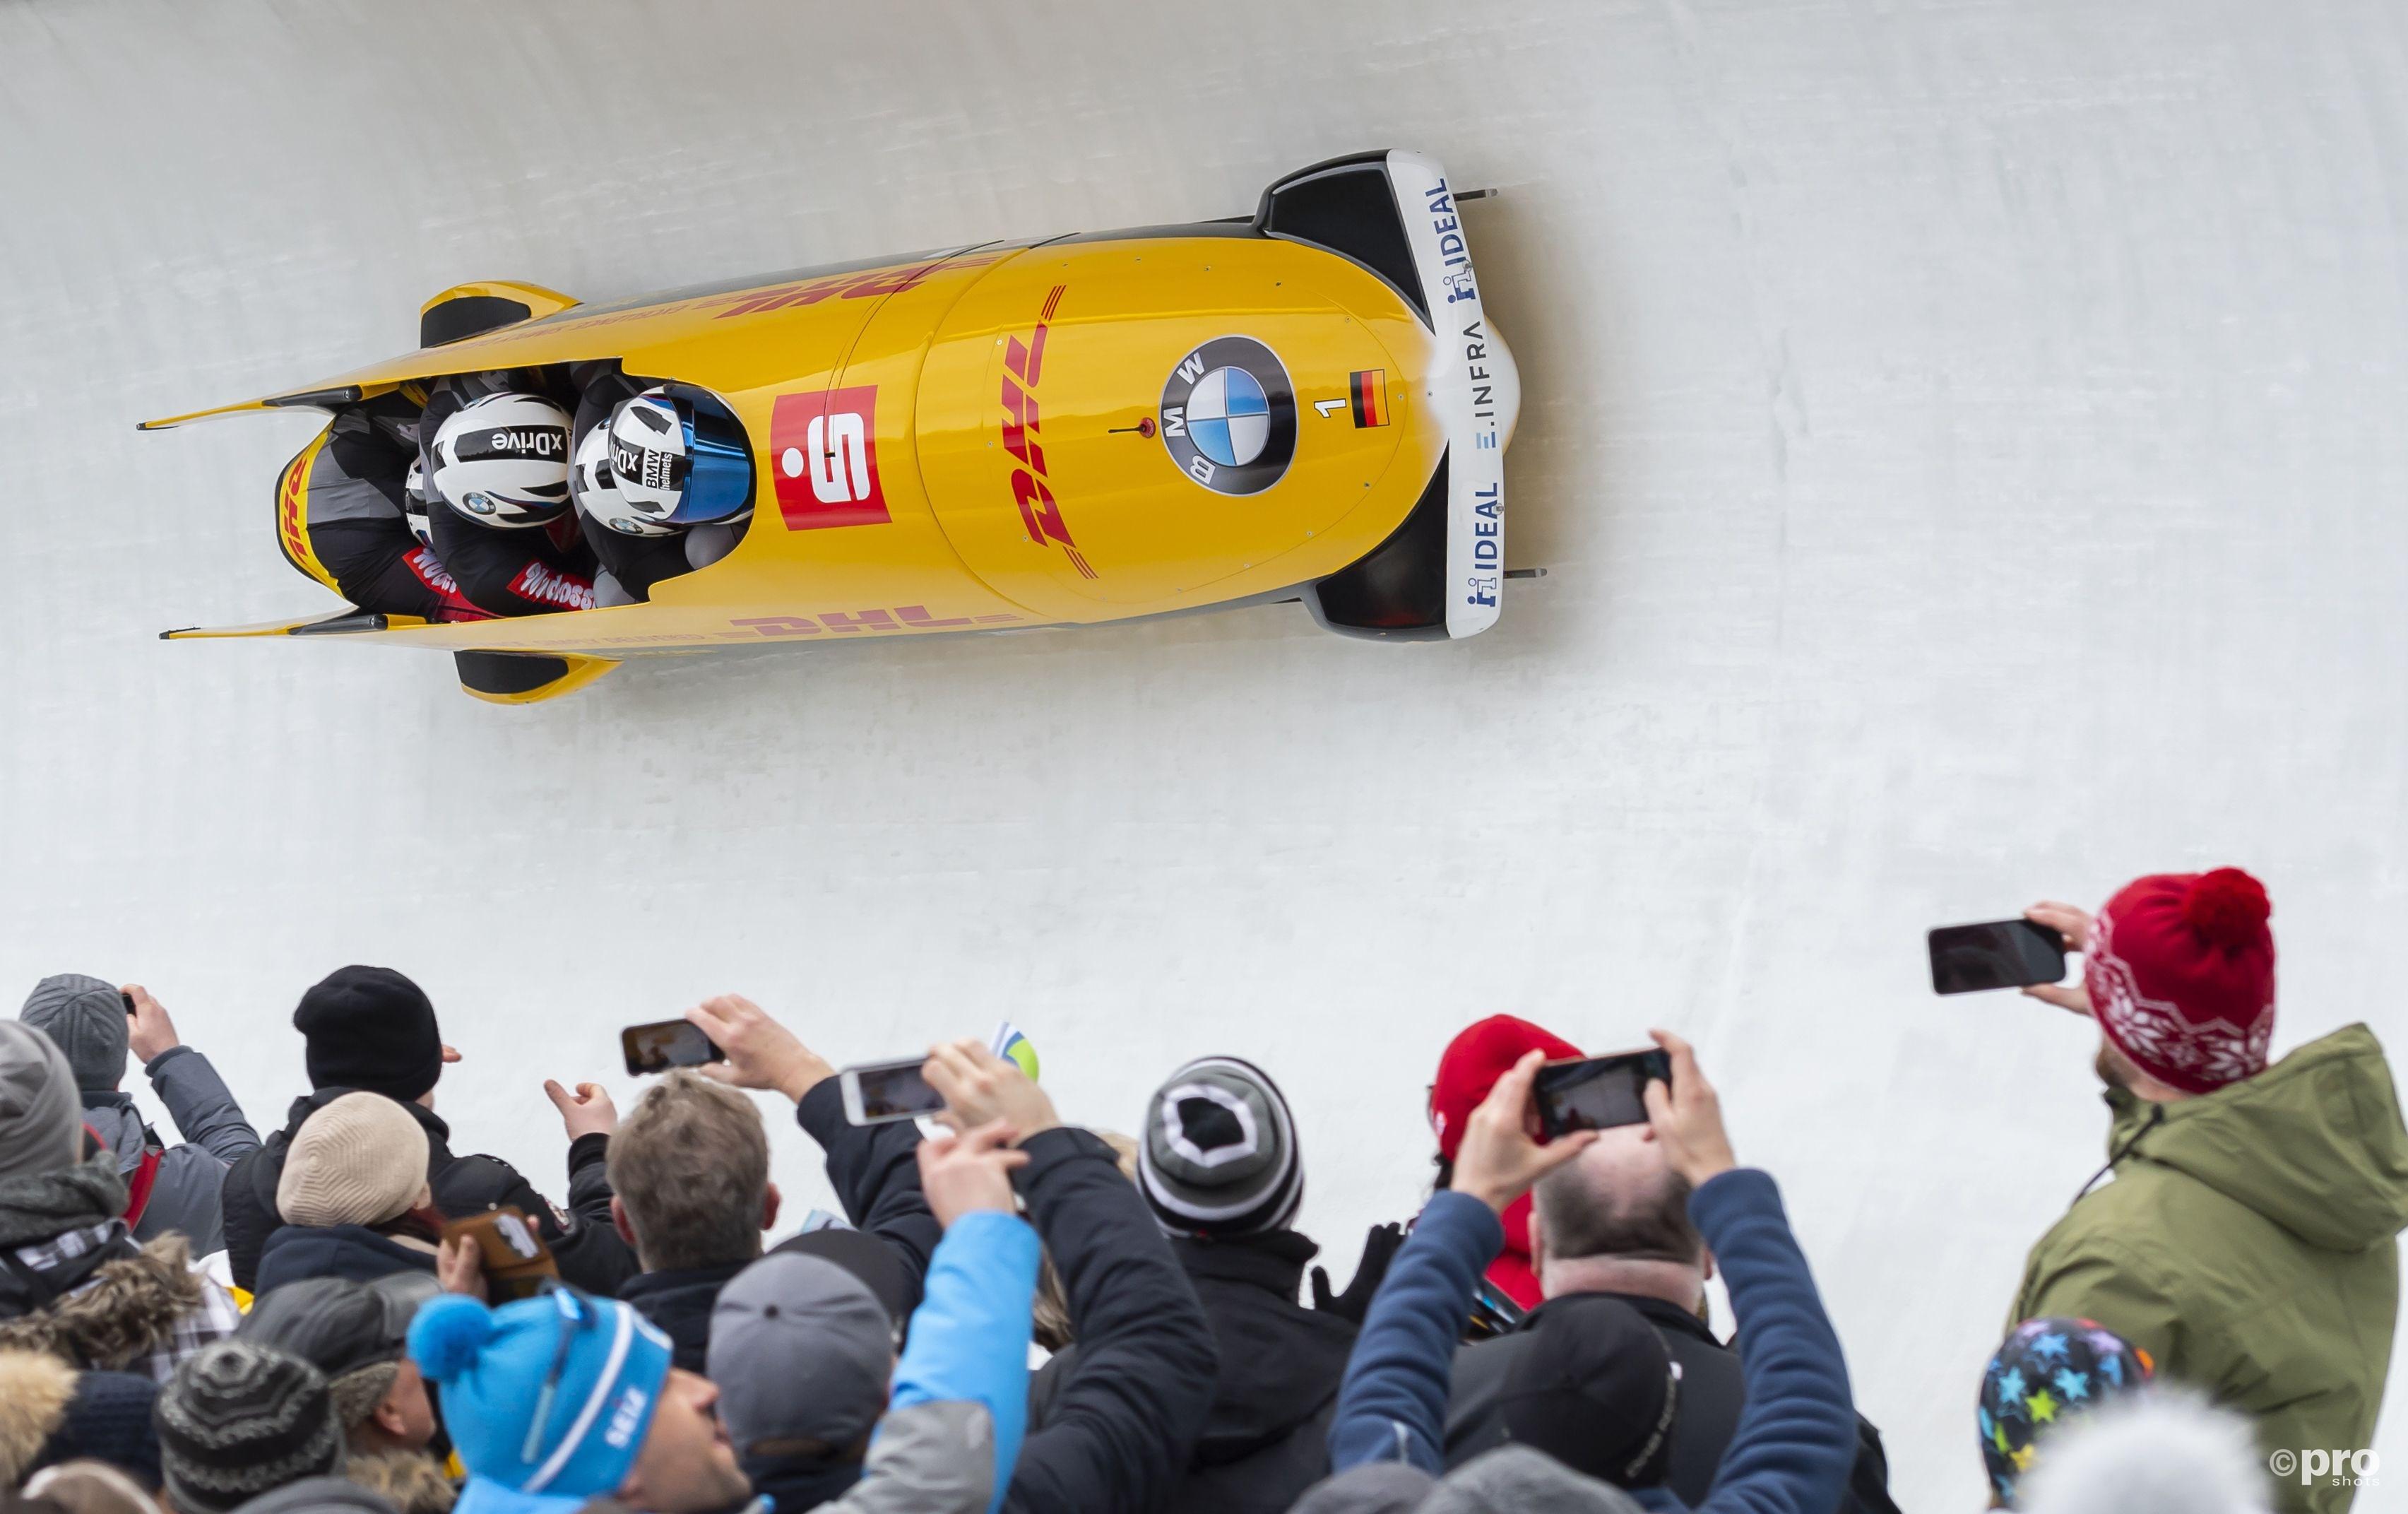 Friedrich jaagt op nóg een gouden medaille (Pro Shots/Action Images)